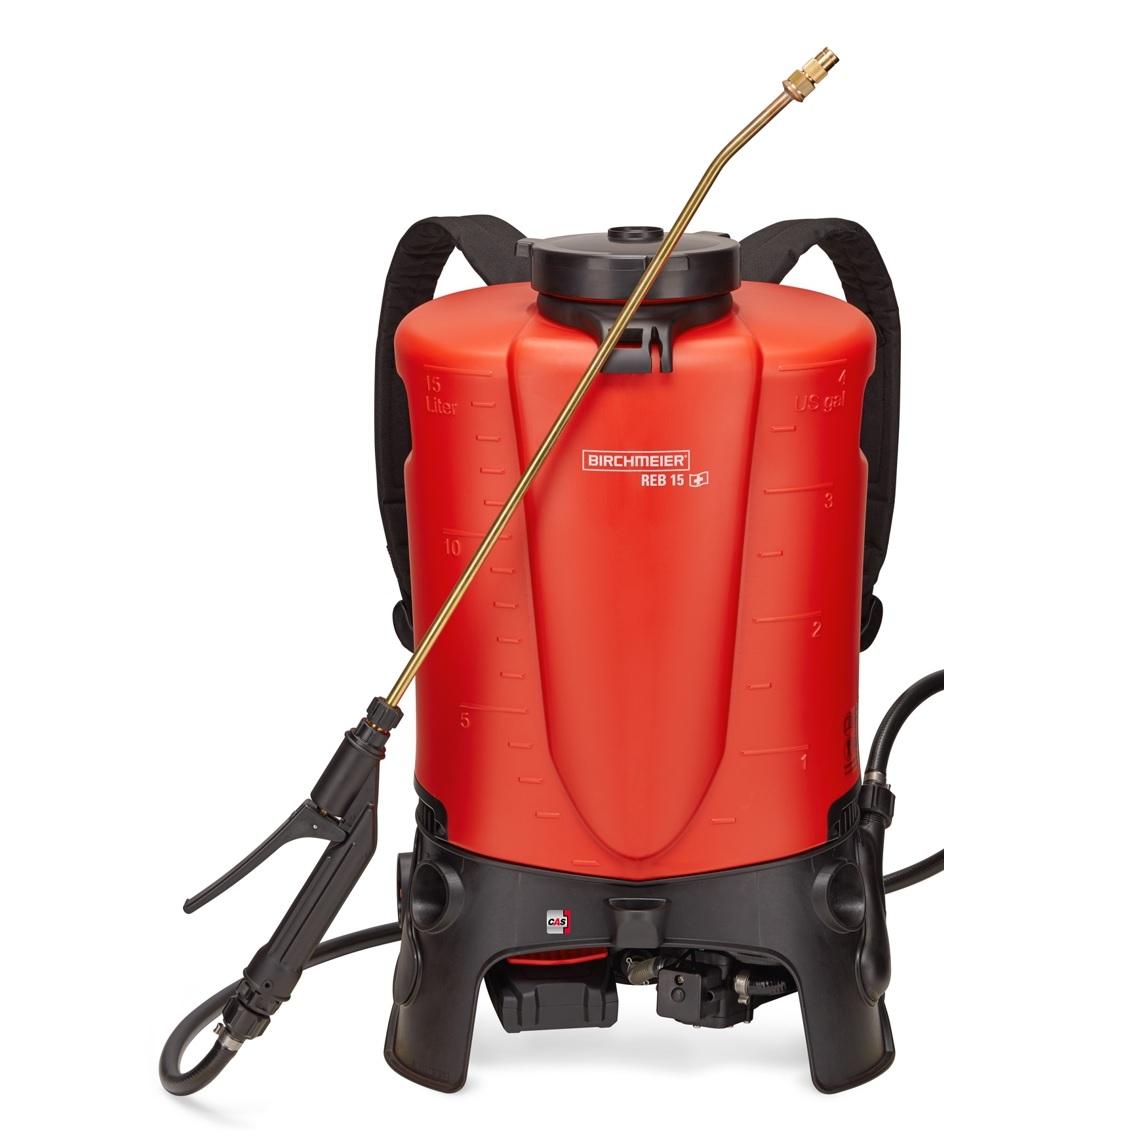 Birchmeier-REDB15-Battery-Back-pack-Sprayer-15litre